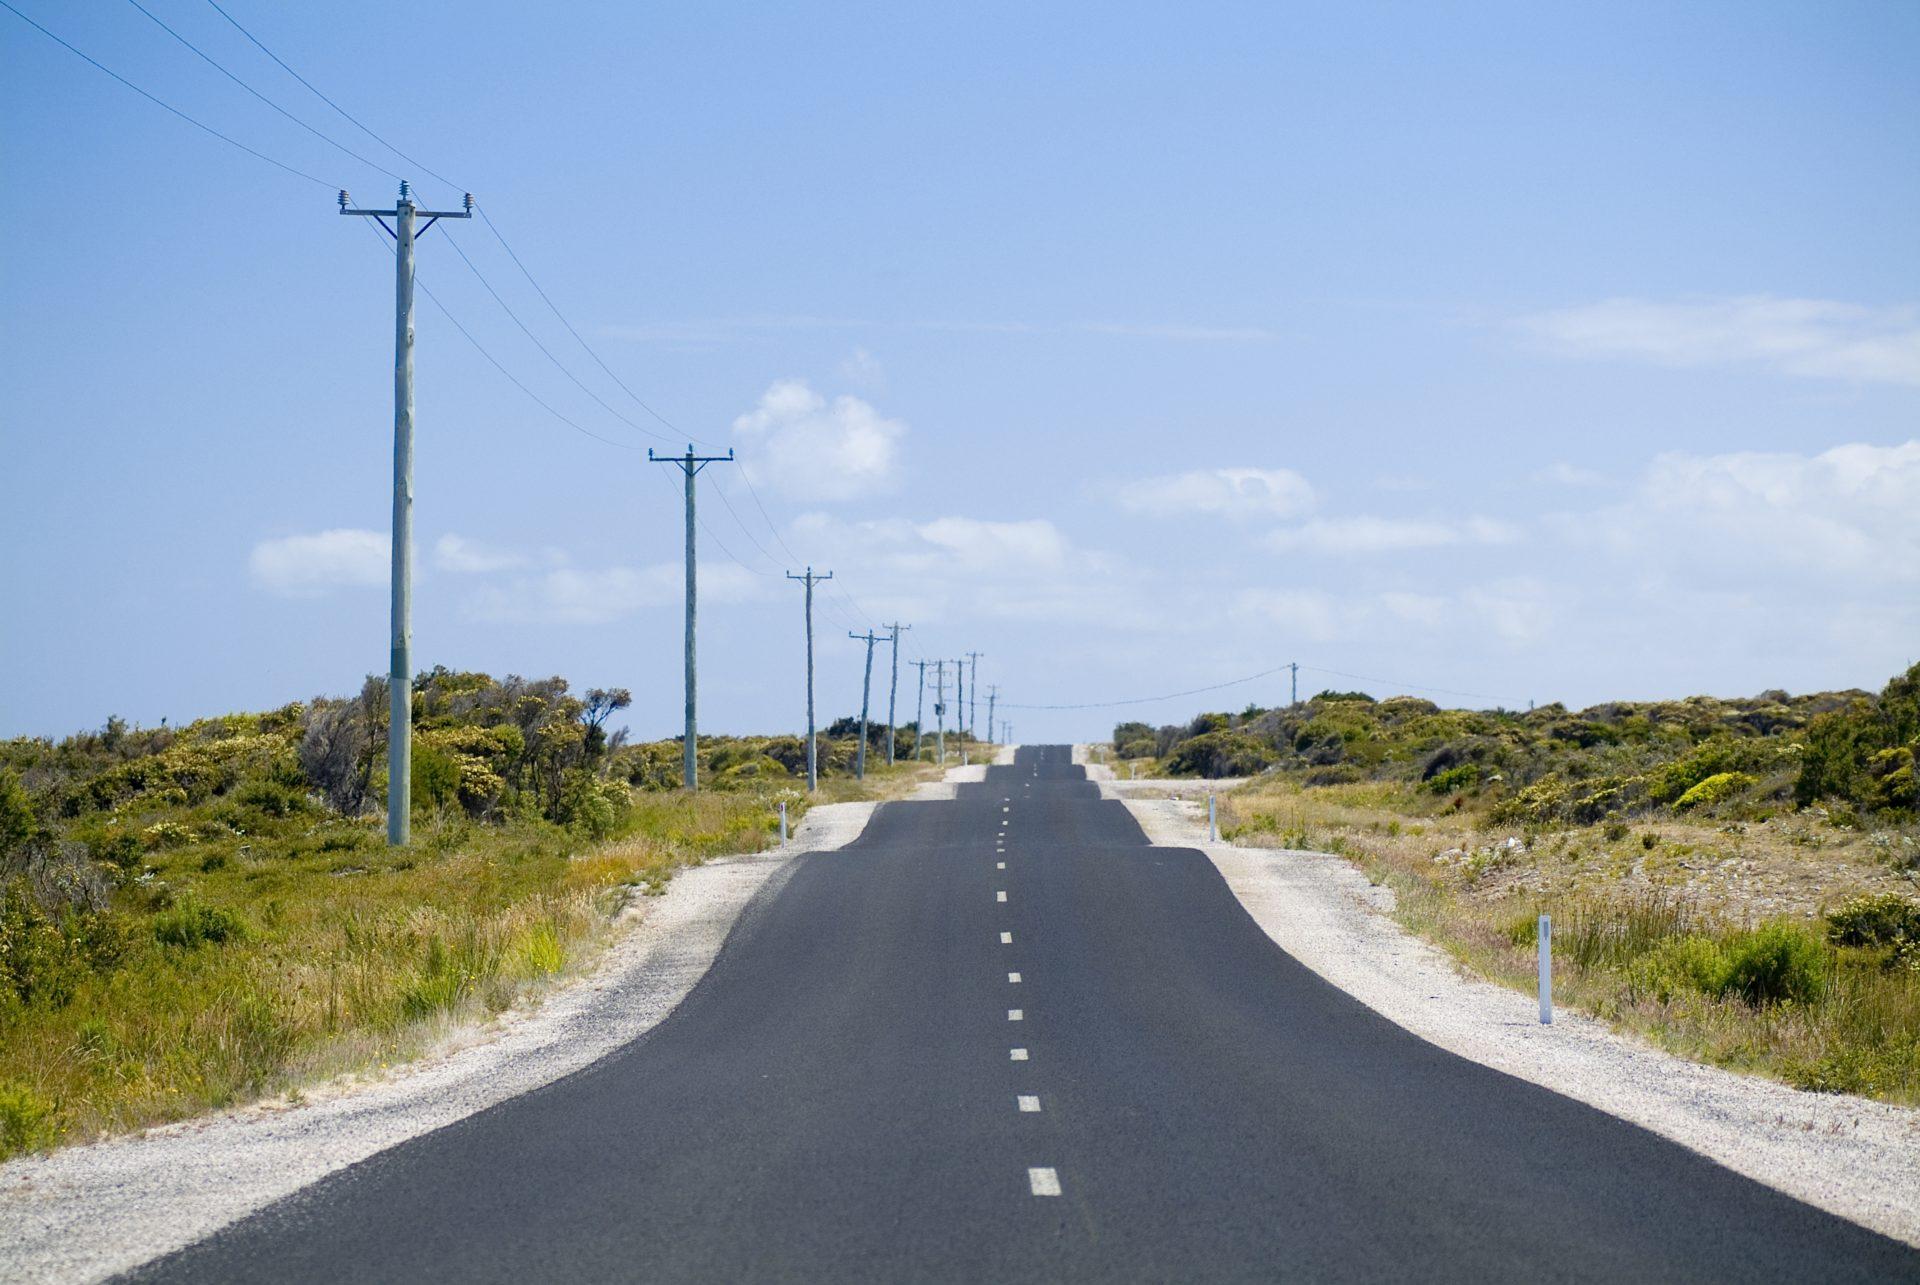 Bumpy road image